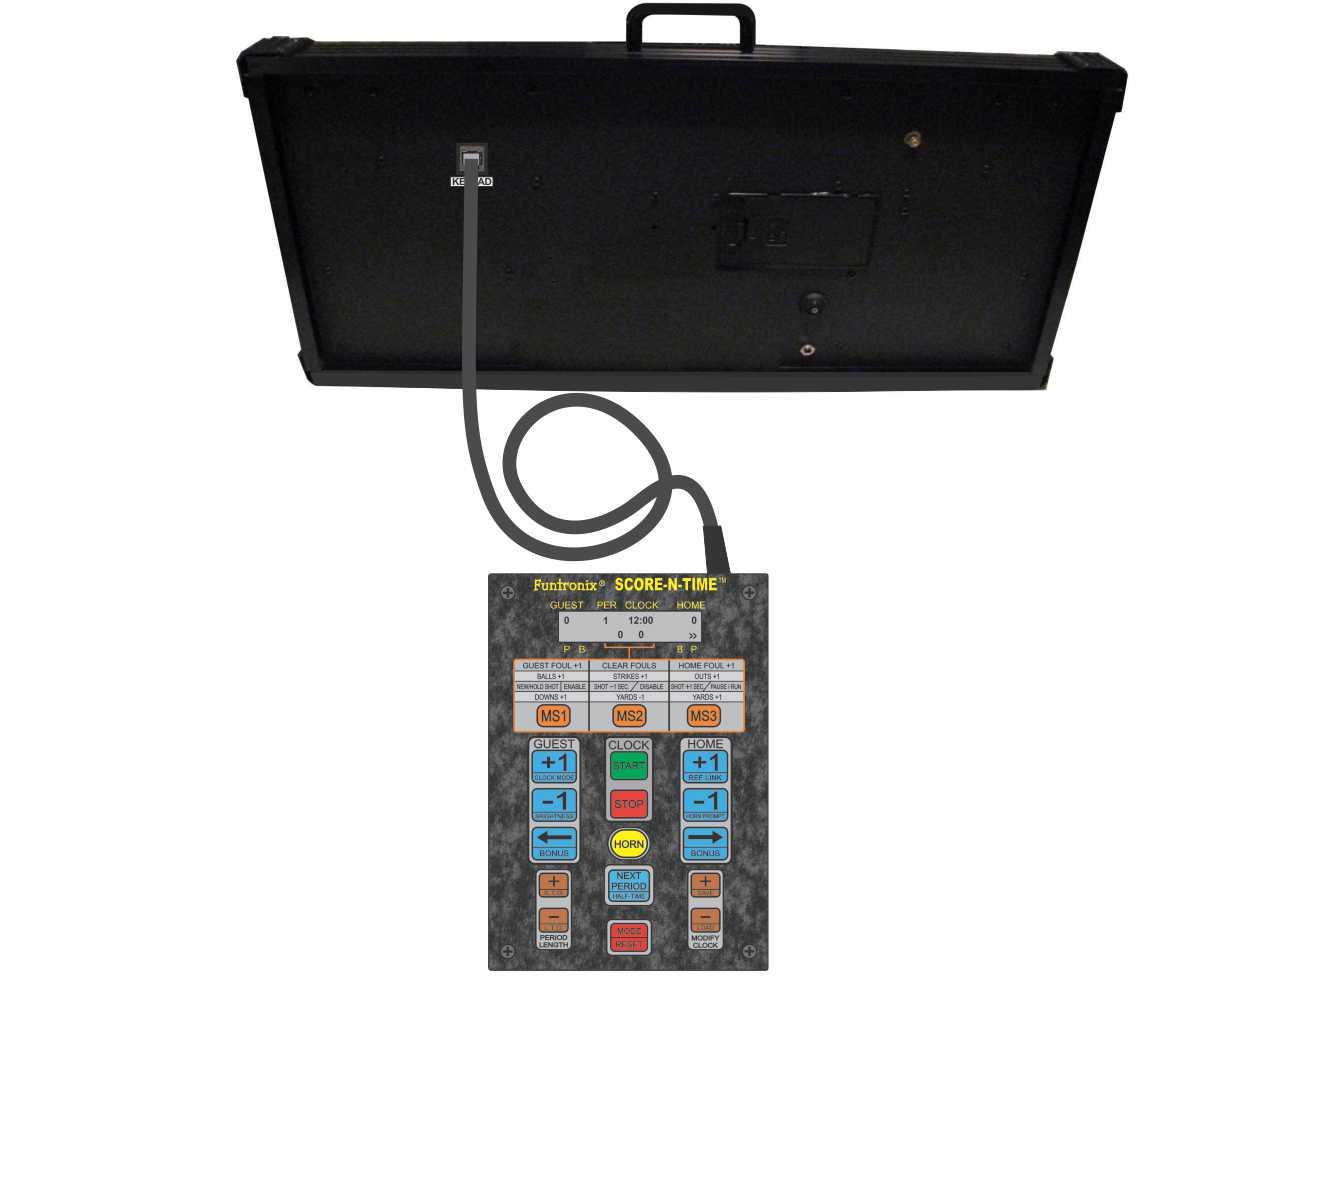 Multisport Portable Scoreboard with Corded Keypad